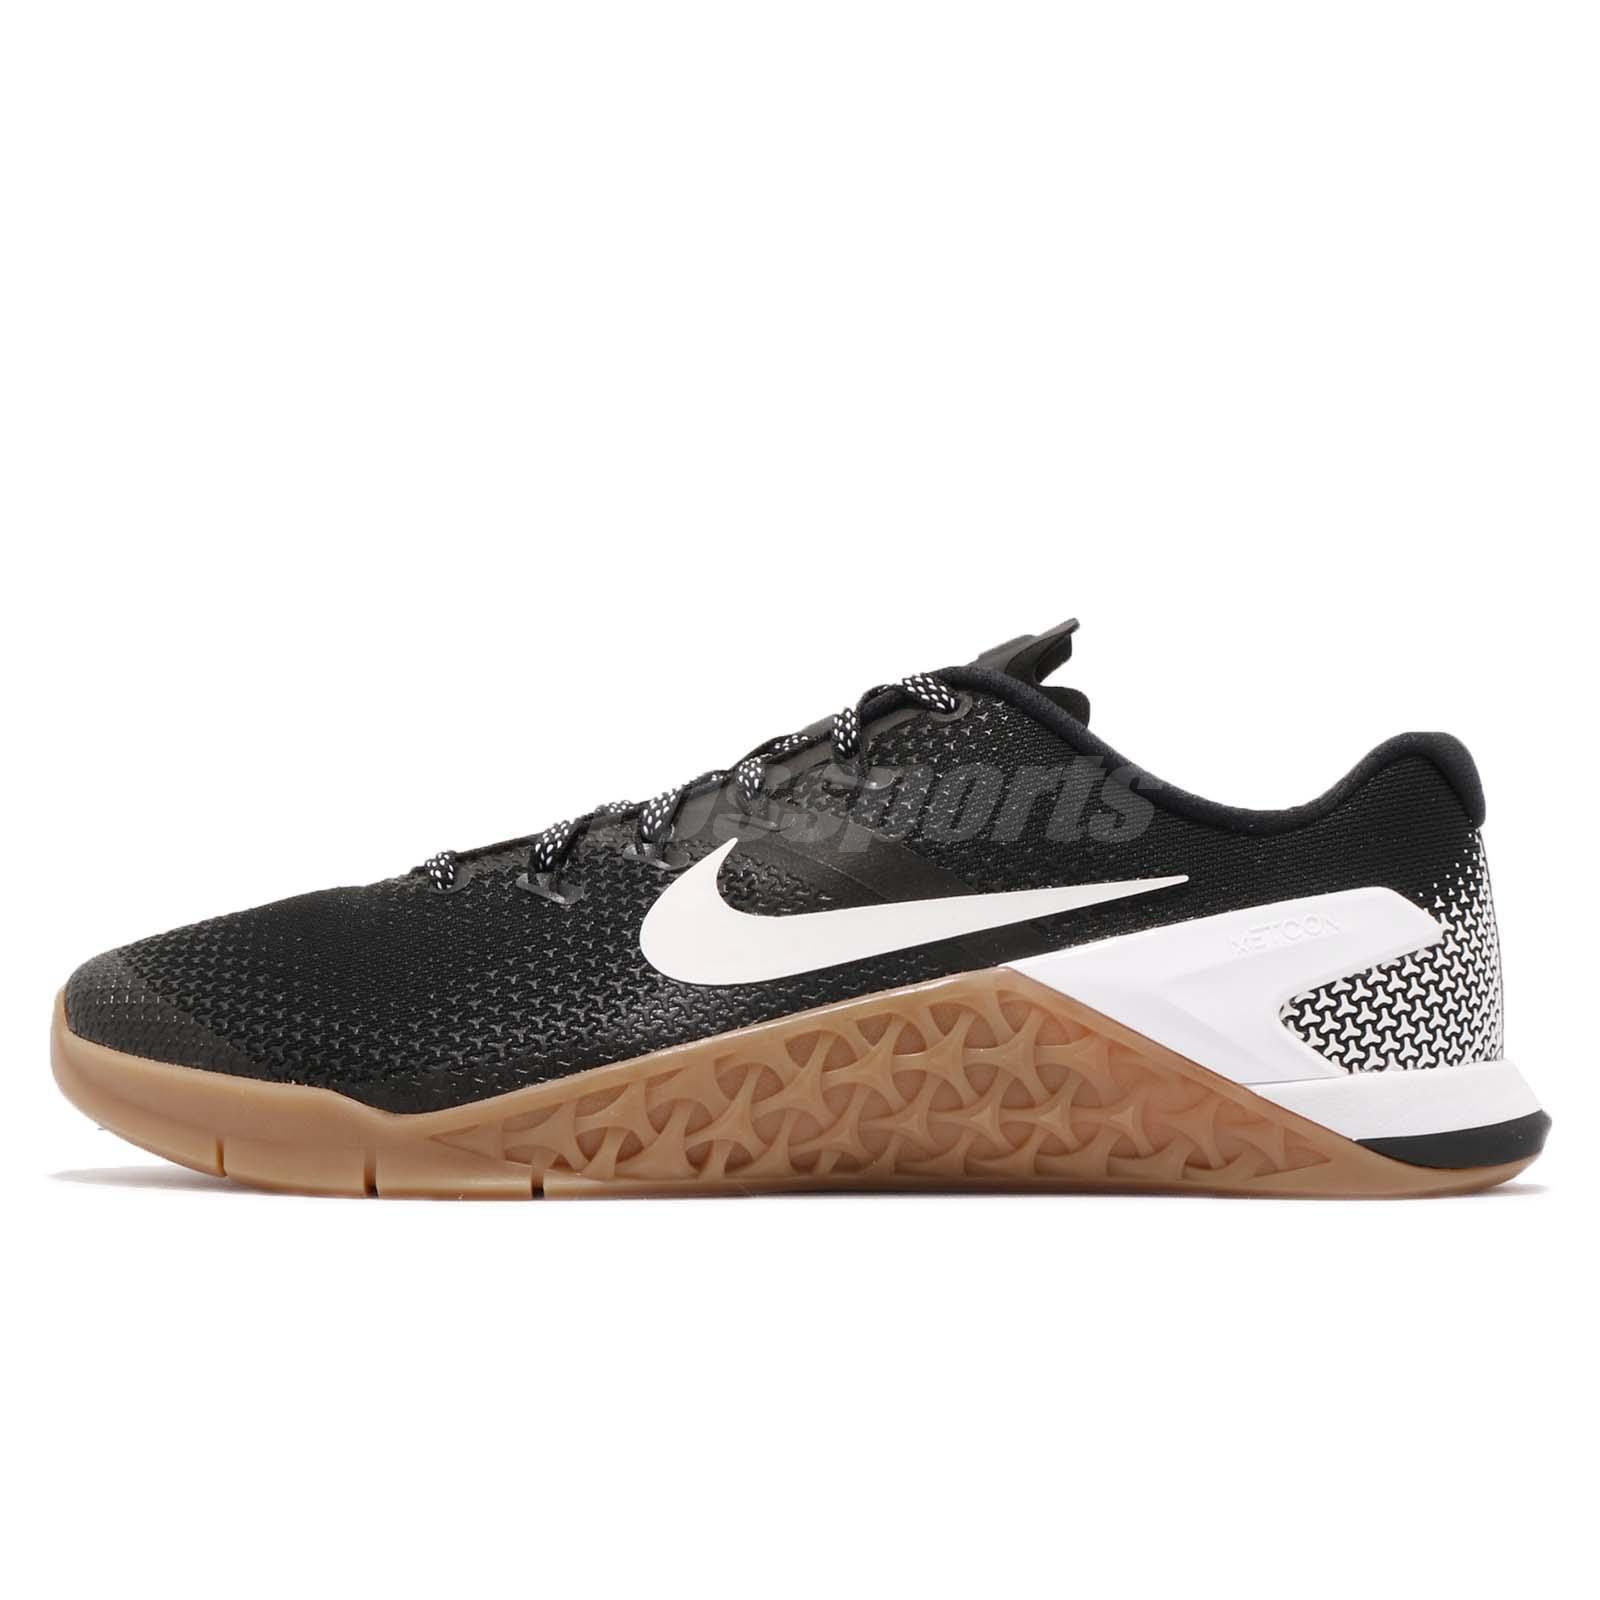 new arrival 83486 90c70 Nike Metcon 4 IV Black White Gum Men Cross Training Shoes Sneakers AH7453 -006